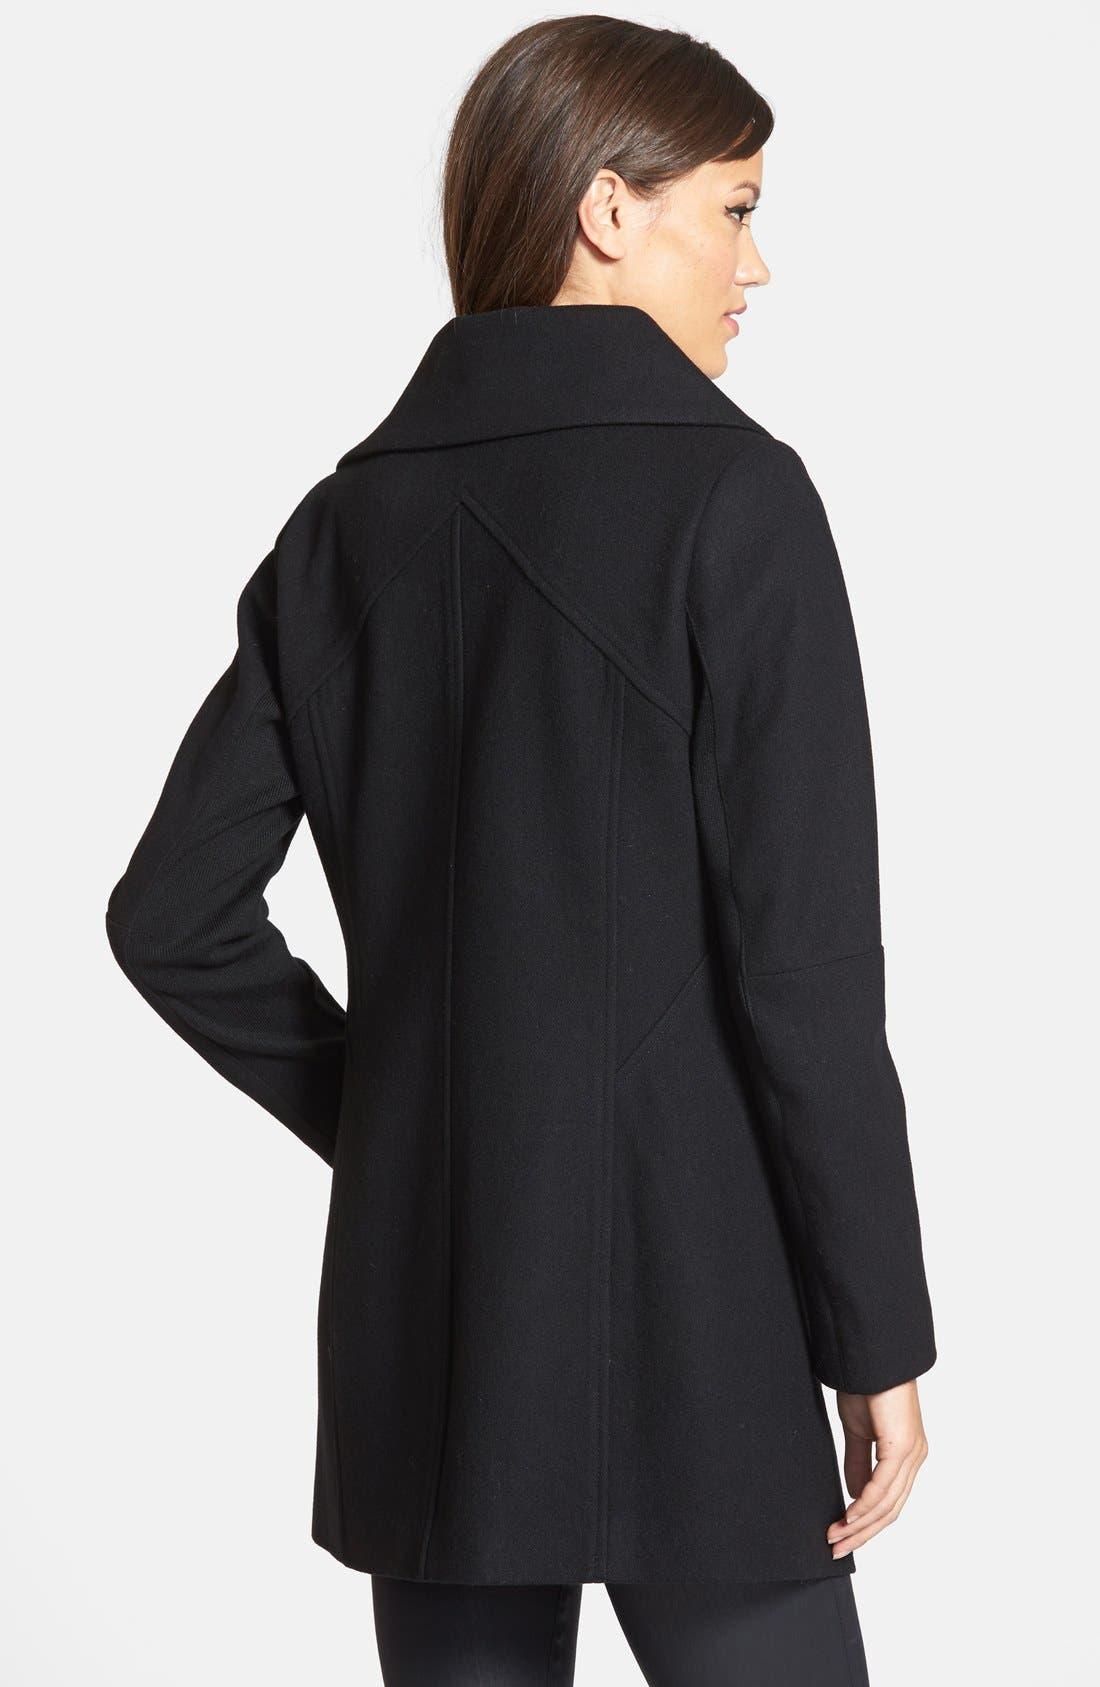 SAM EDELMAN,                             'Fallon' Faux Leather Trim Asymmetrical Wool Blend Coat,                             Alternate thumbnail 2, color,                             001